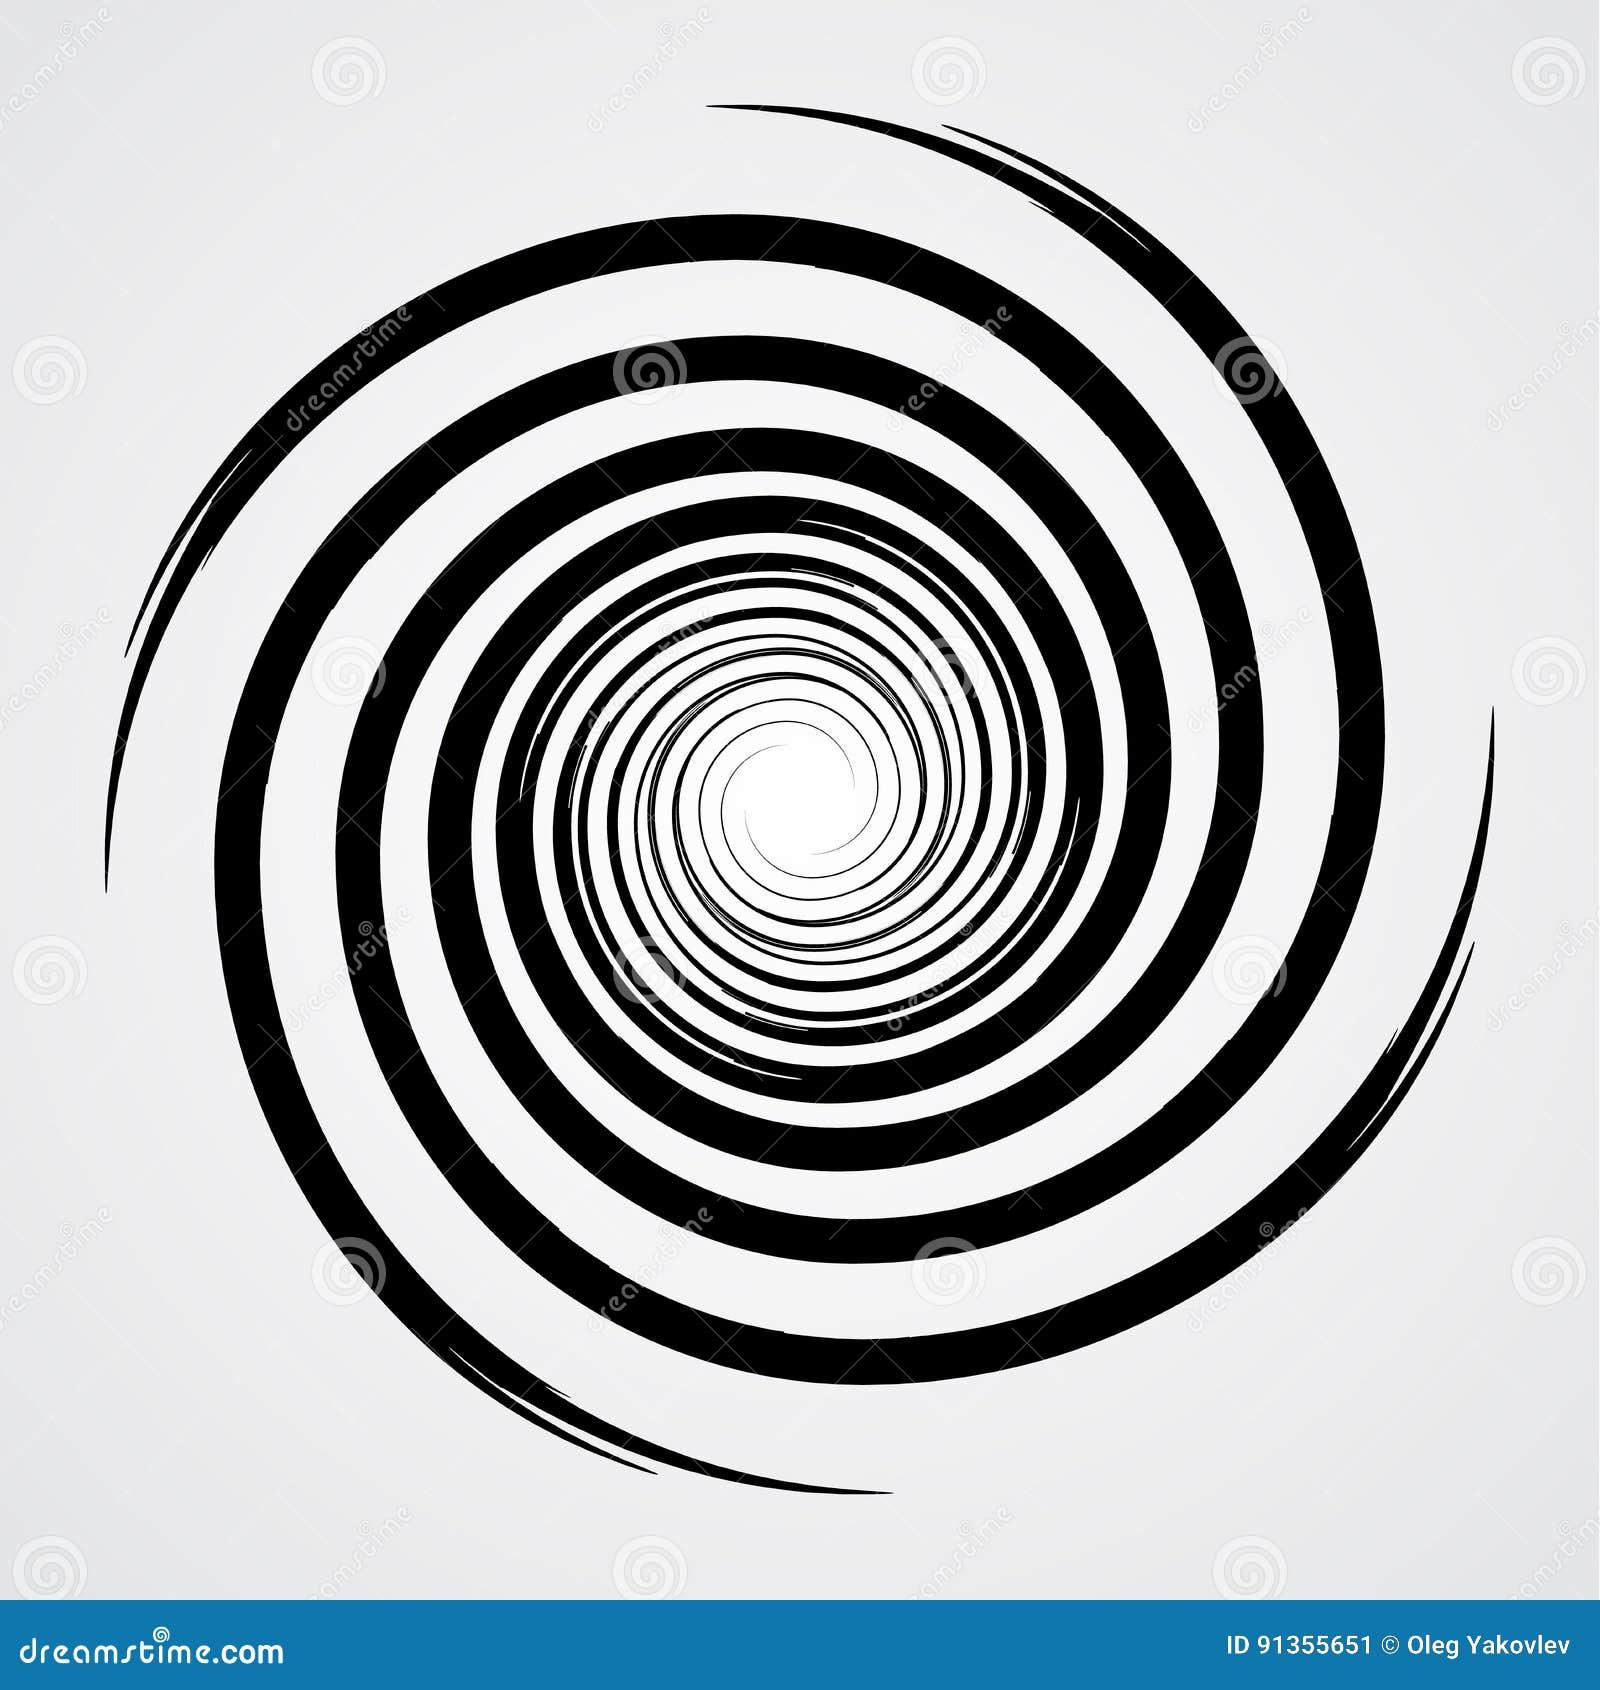 black spiral swirl circle stock vector illustration of hypnotic